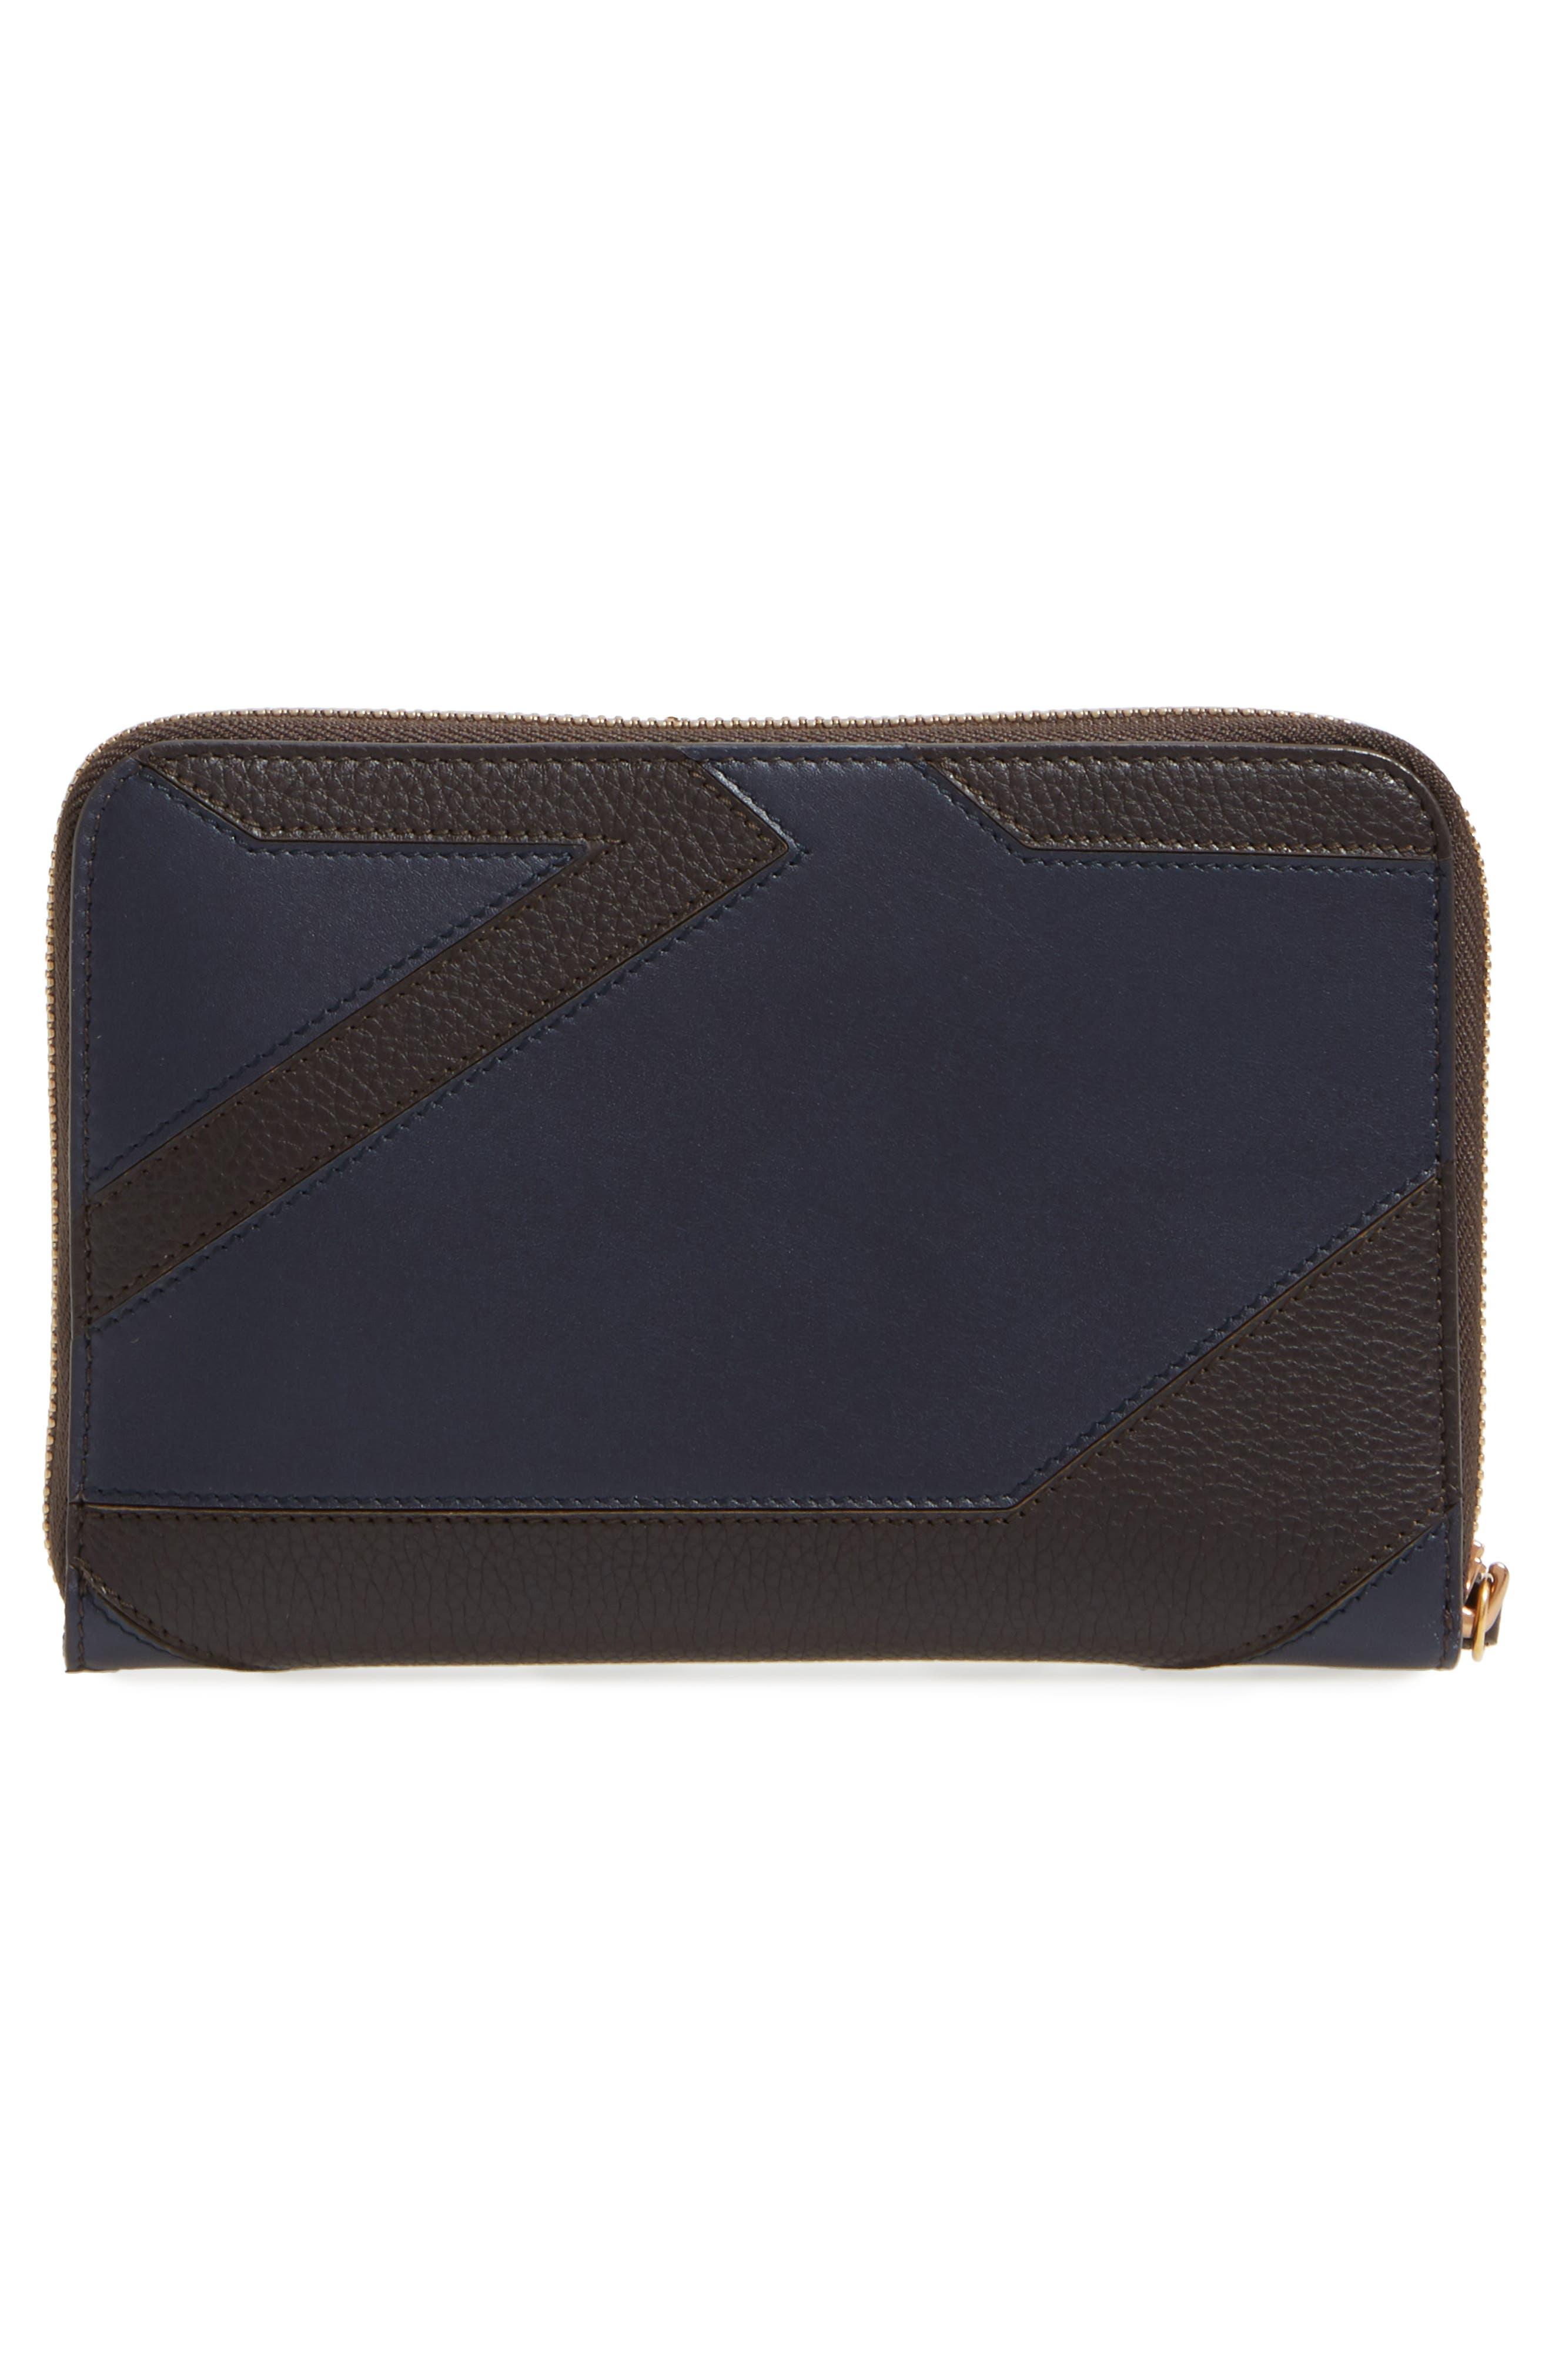 Zip Wallet,                             Alternate thumbnail 3, color,                             245